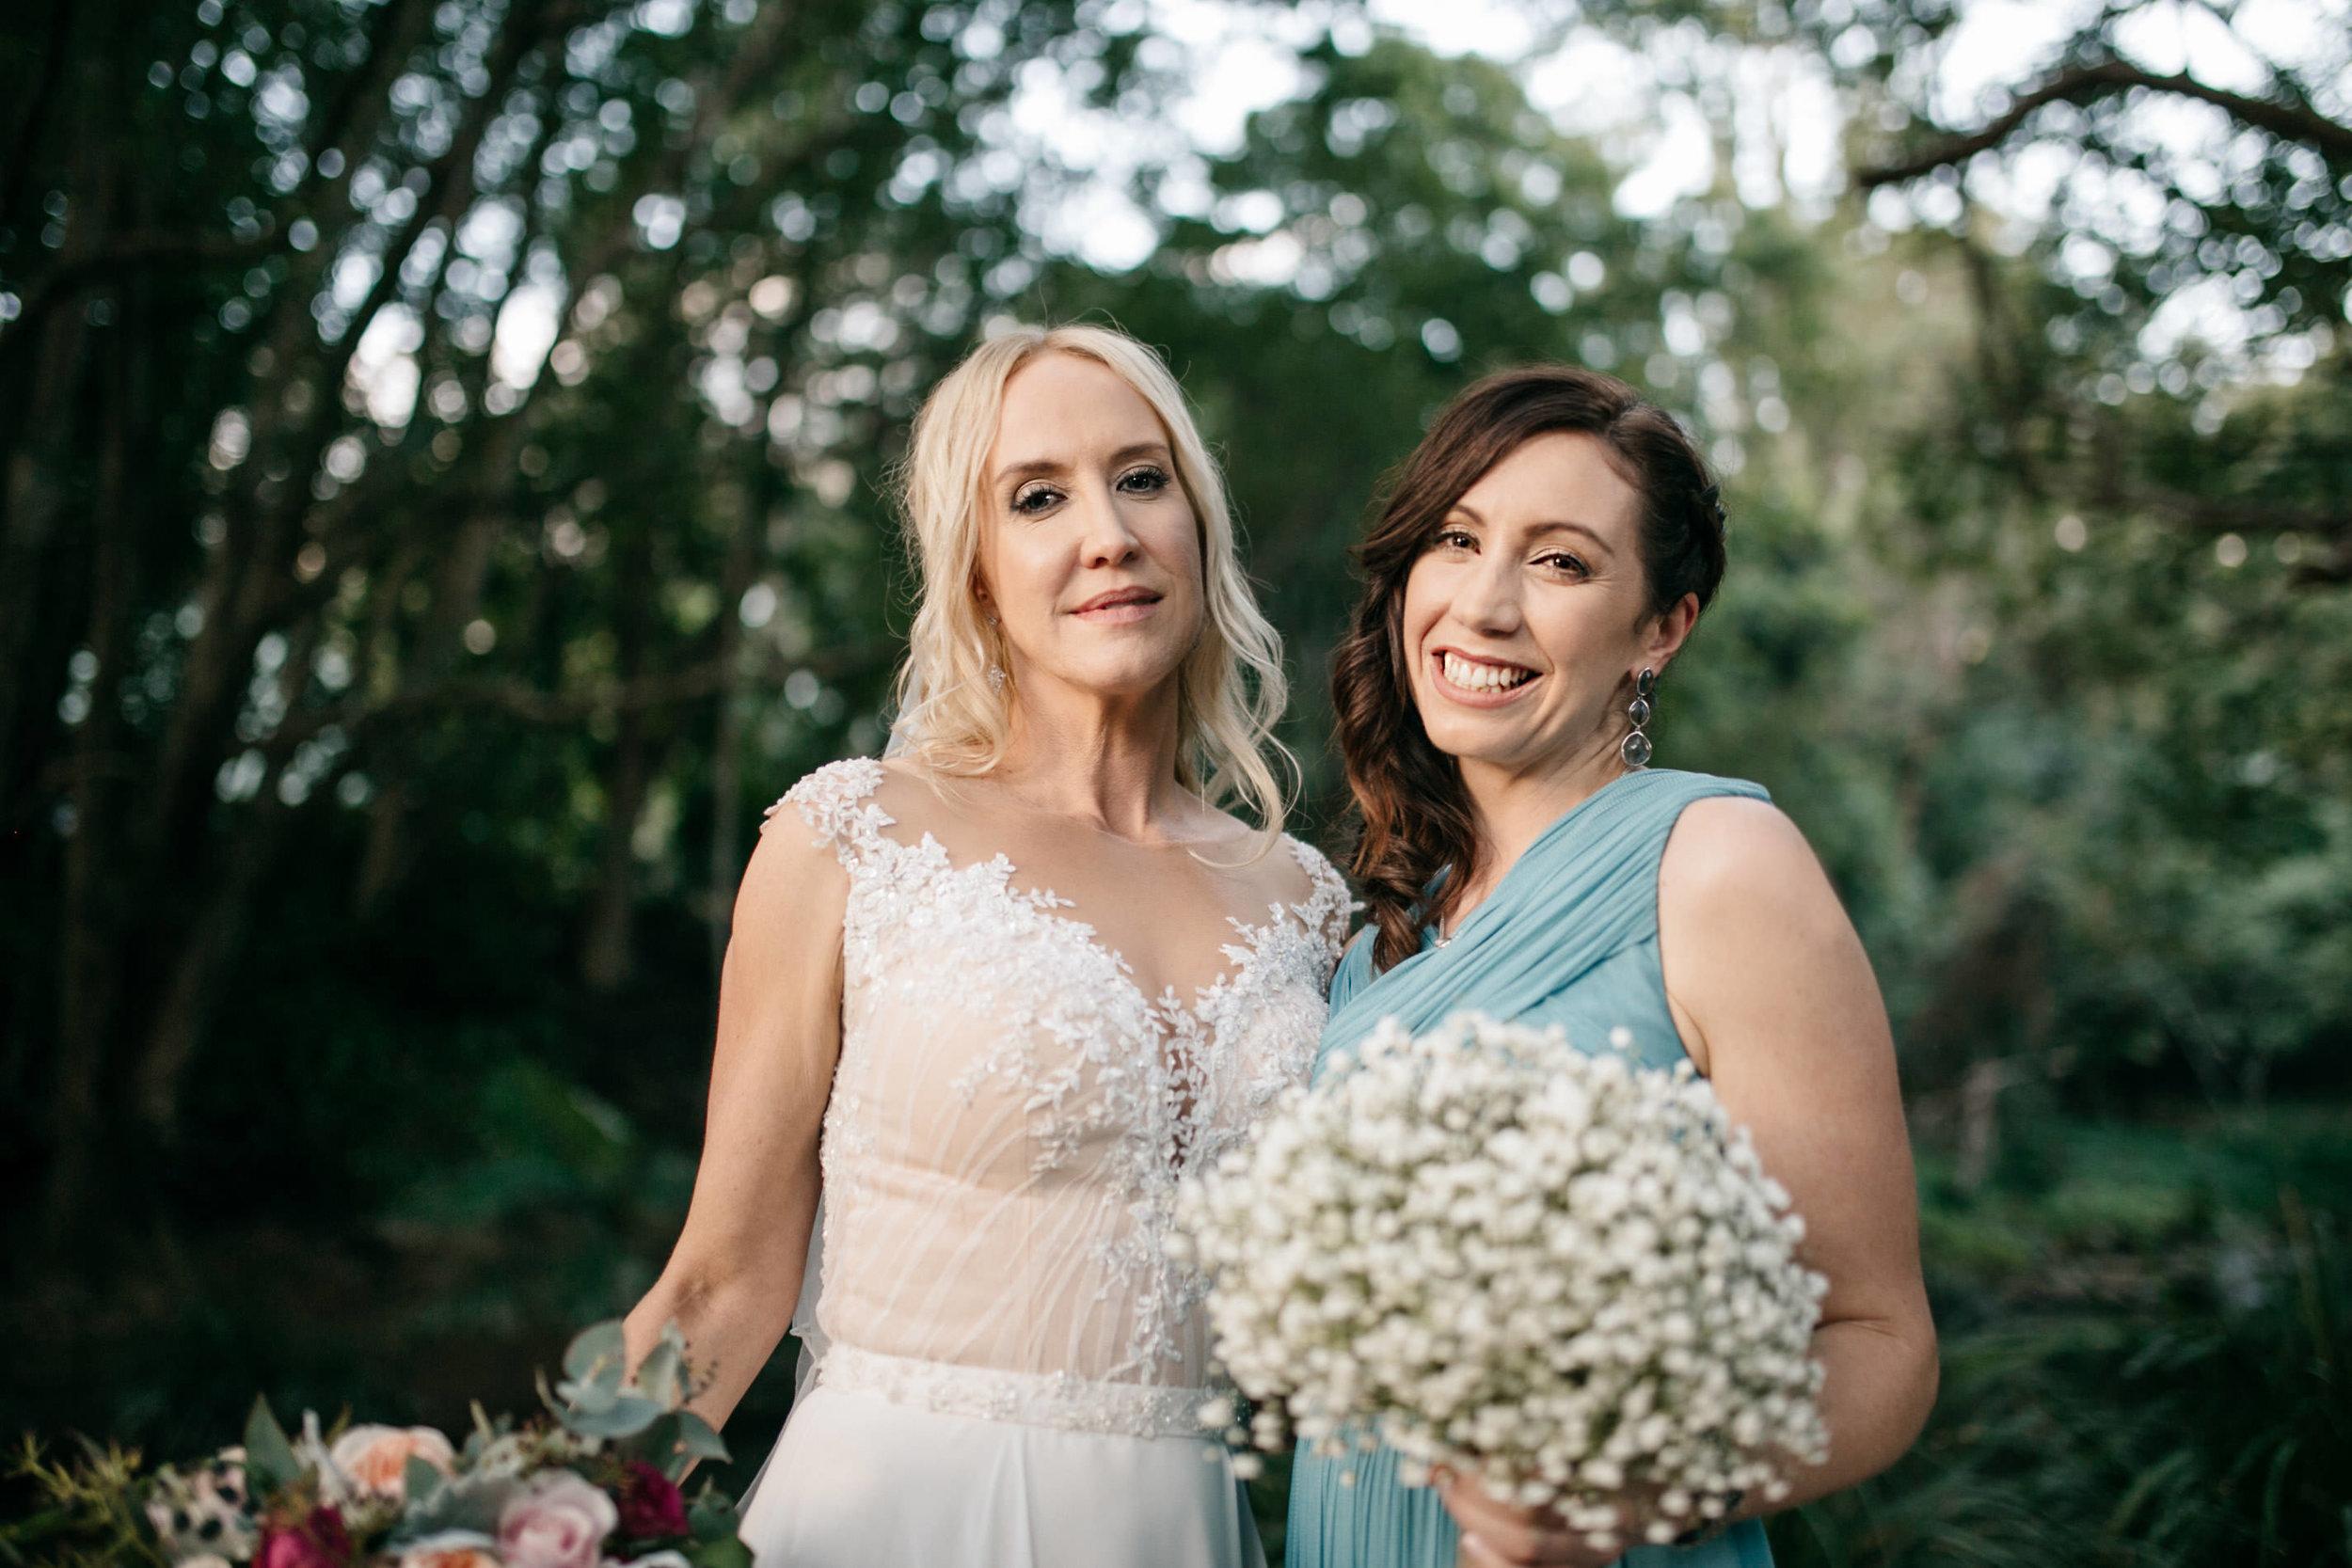 True North Photography_Boomerang Farm_Stacey and Isaac_Gold Coast Wedding_Barm Wedding_Hinterland Wedding-156.jpg